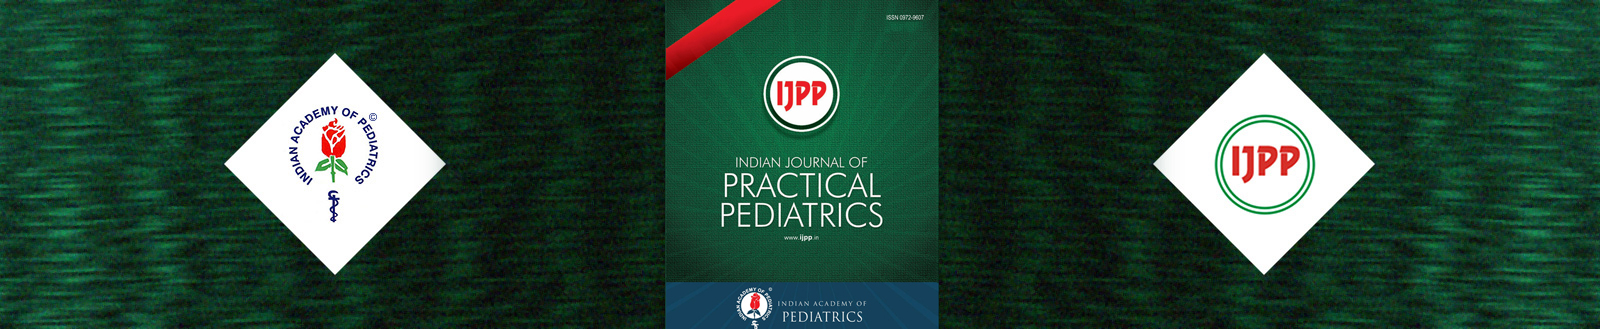 Indian Journal of Practical Pediatrics, Chennai